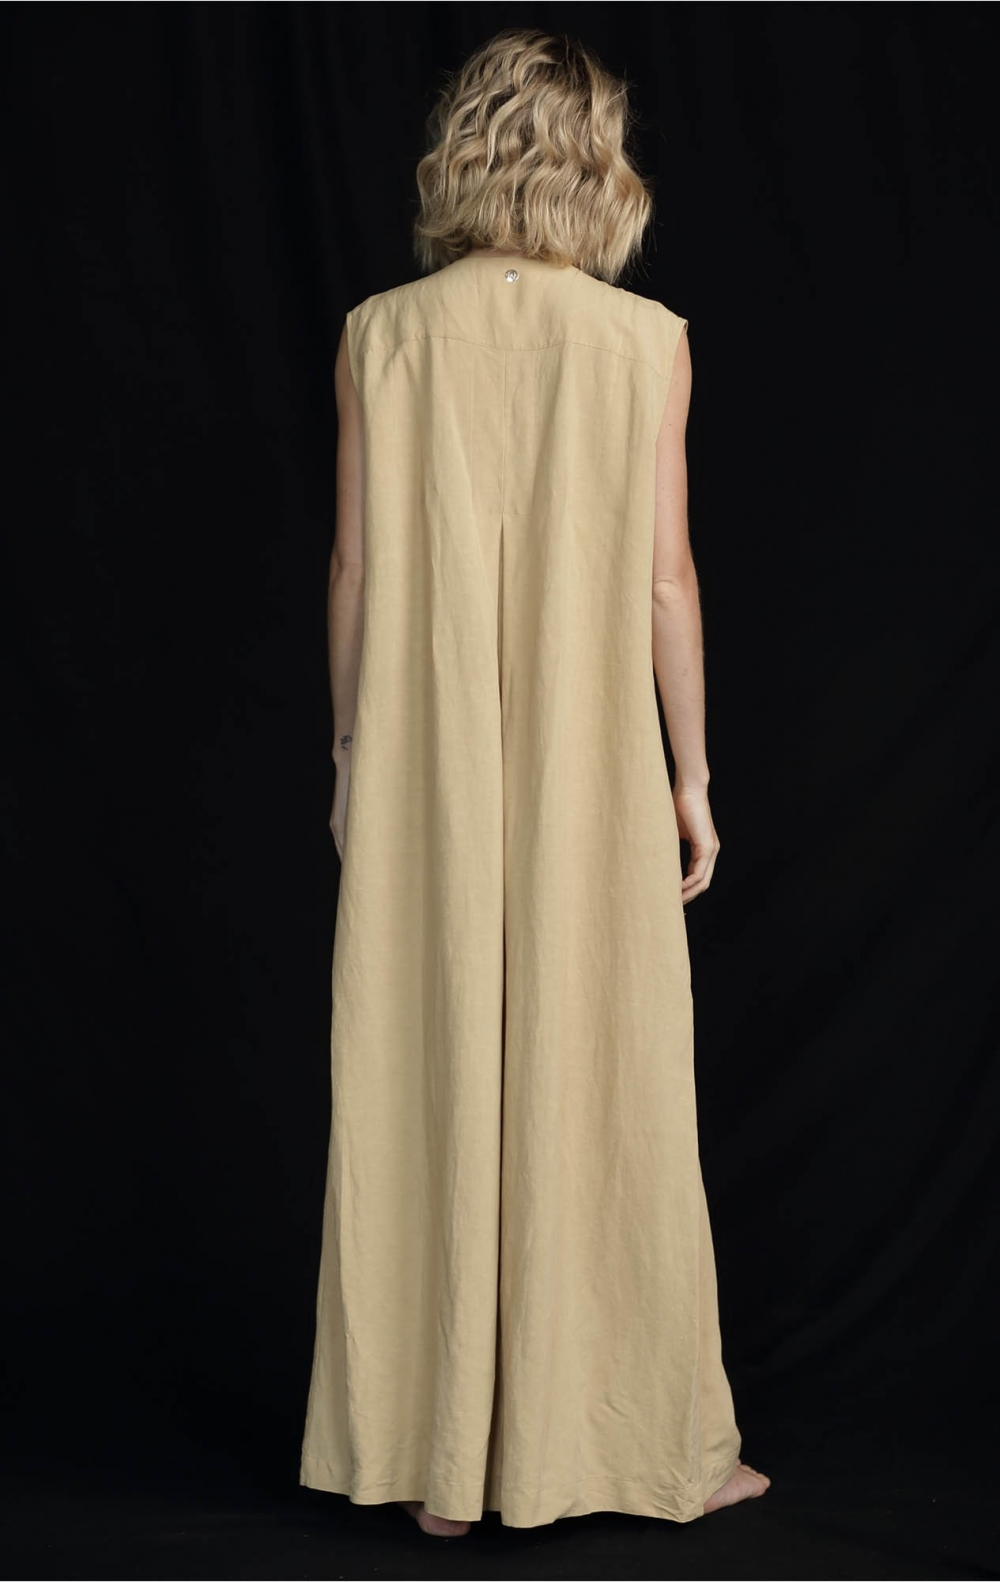 Vestido Liocel Agata Bege   - Foto 3